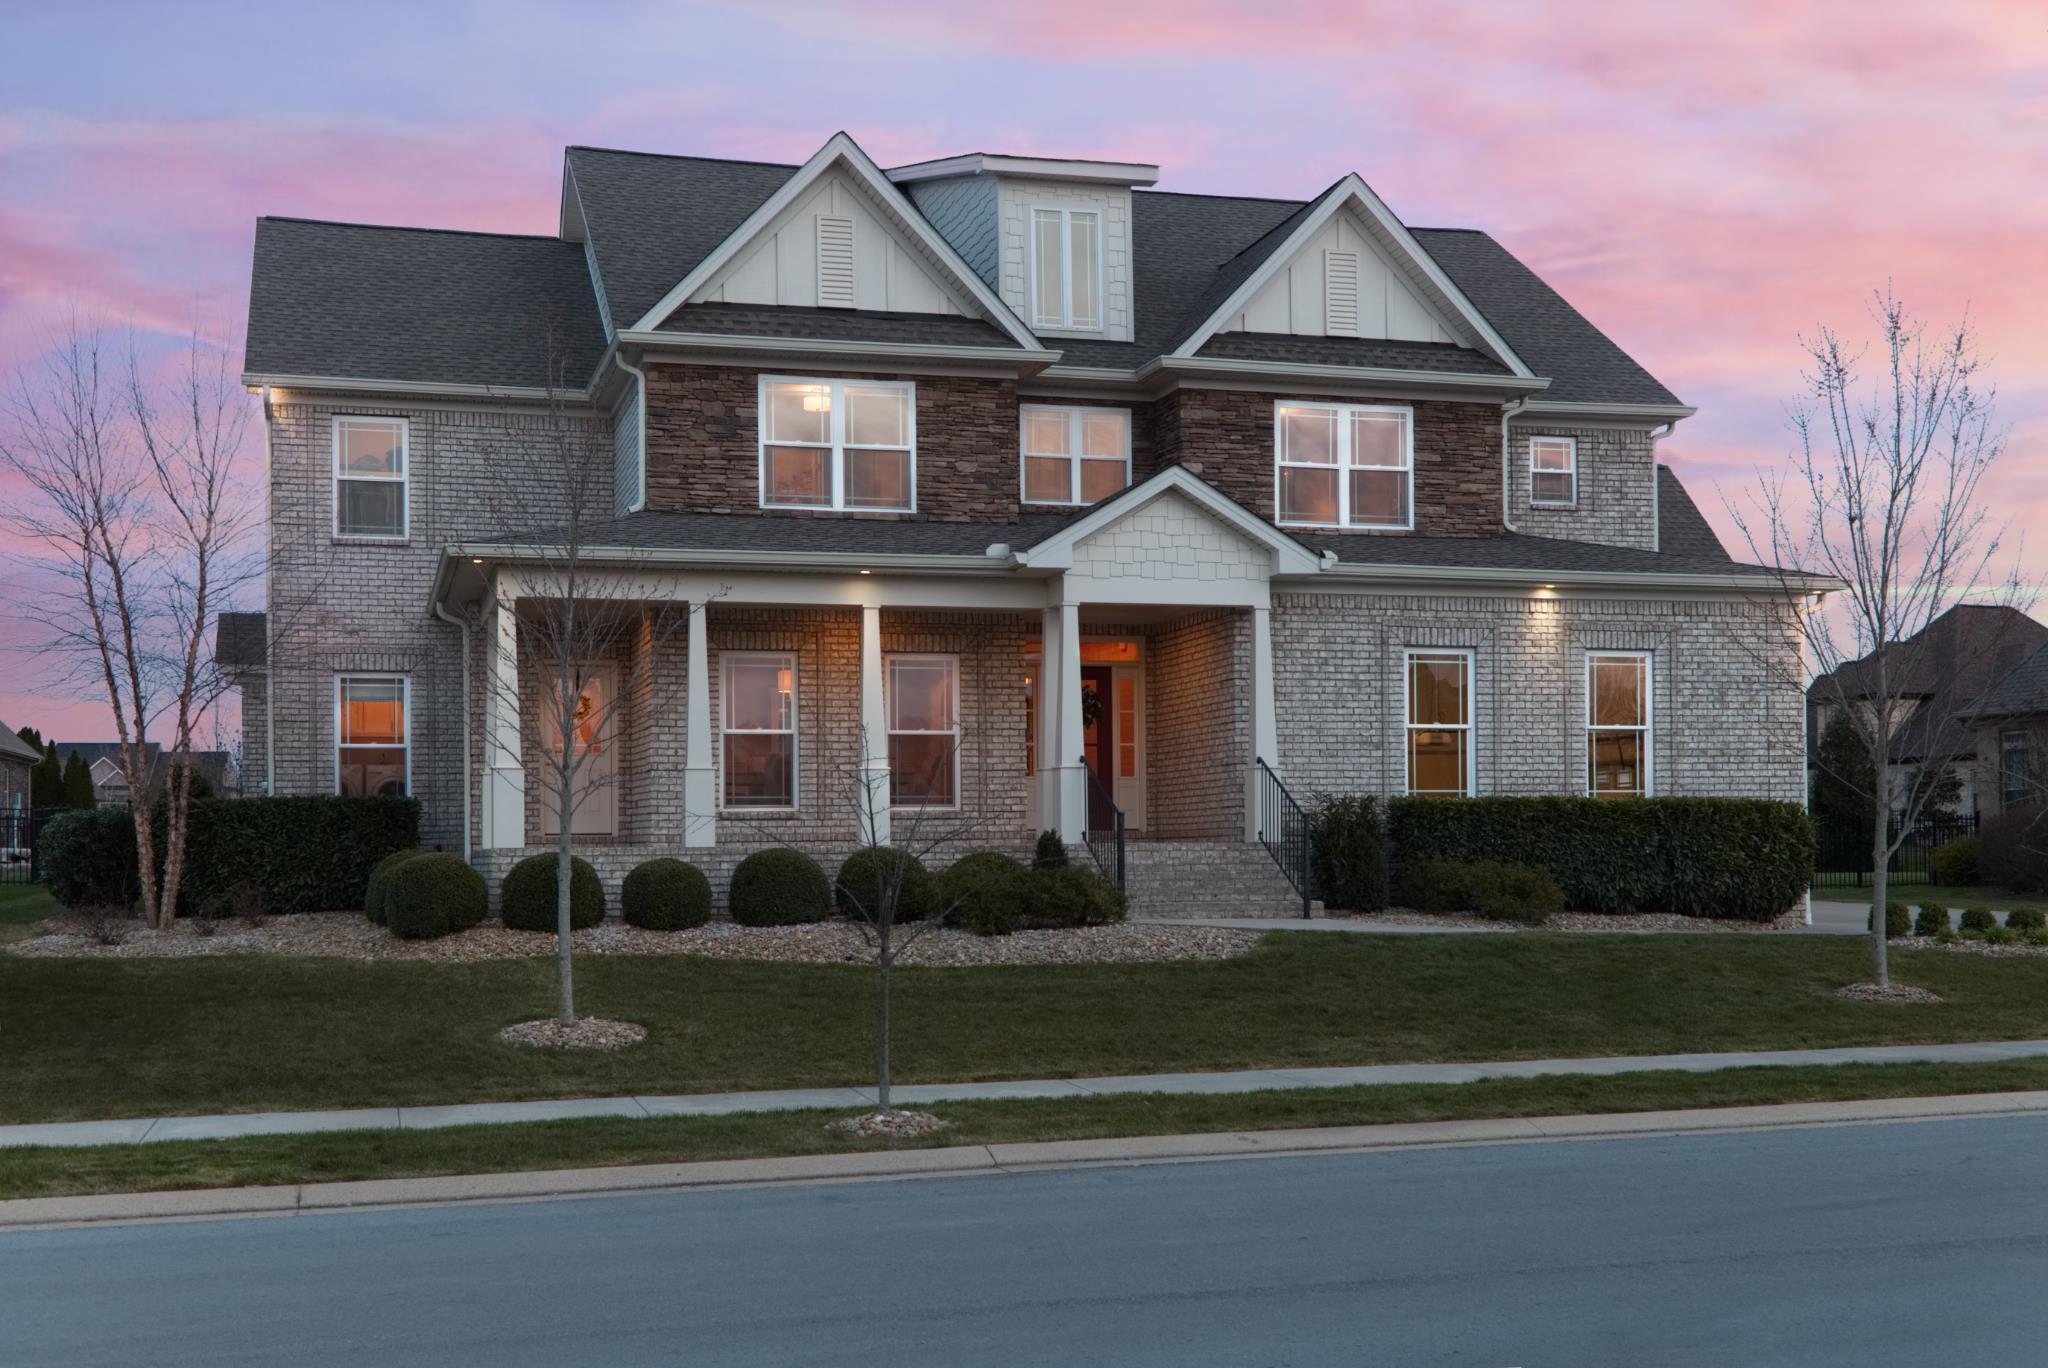 2005 Rolling Creek Dr, Murfreesboro, TN 37128 - Murfreesboro, TN real estate listing